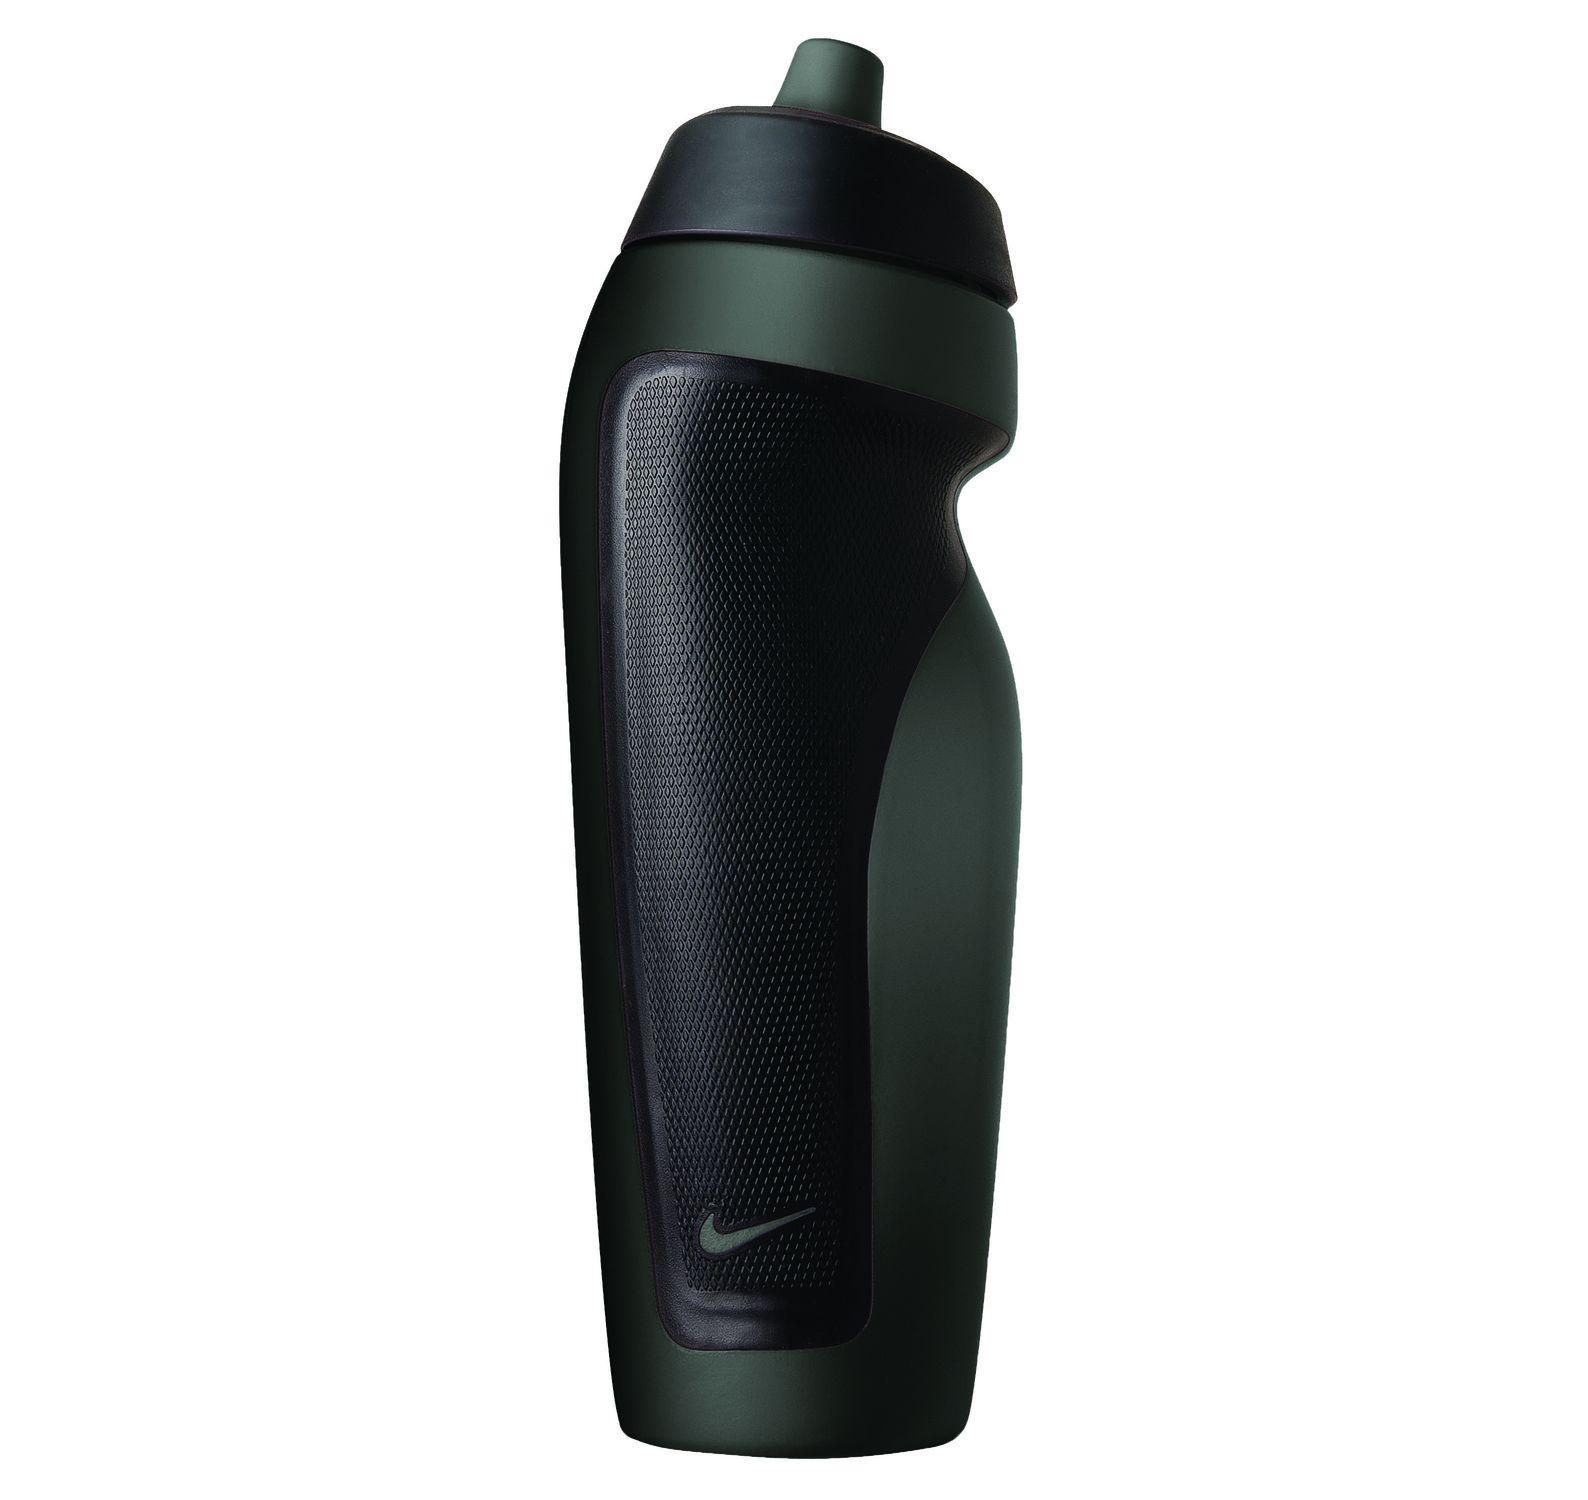 Nike Sport Water Bottle, Anthracite/Black, Onesize, Nike